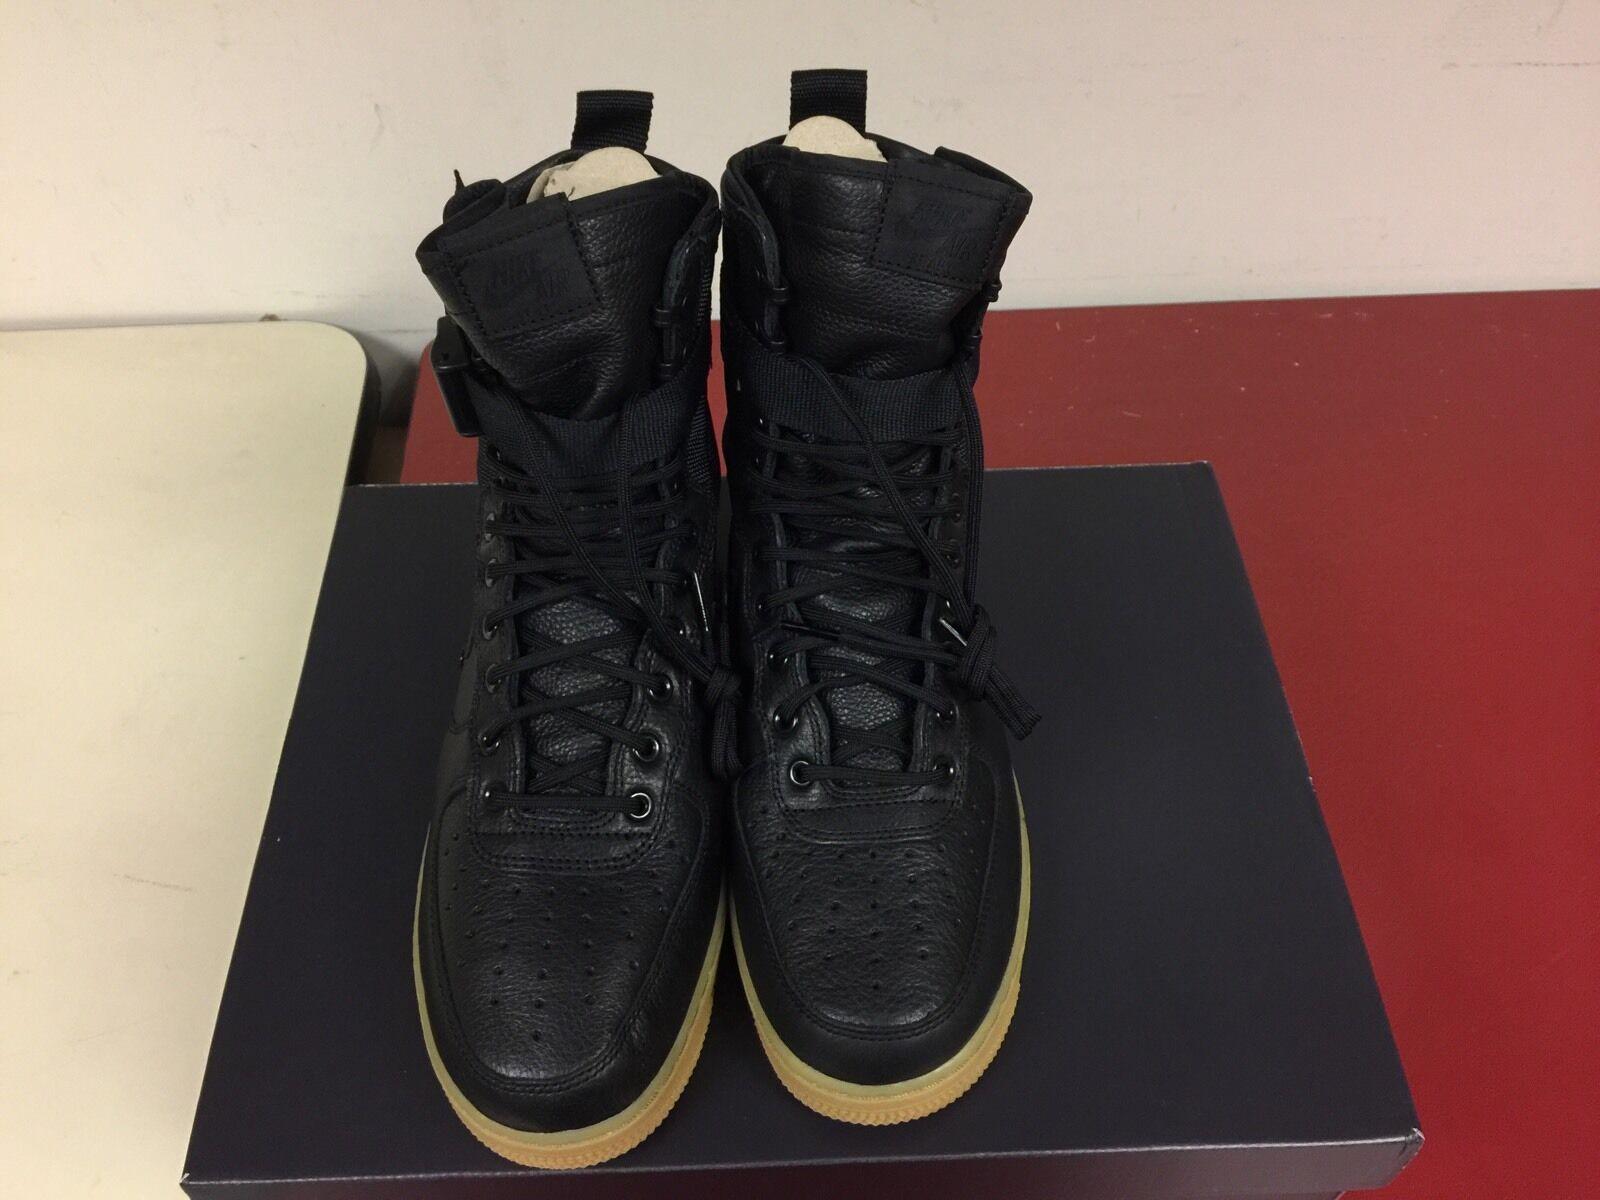 Nike Special Field SF AF Air Force 1 Black Gum Olive 859202-009 Ship Now SZ 9.5